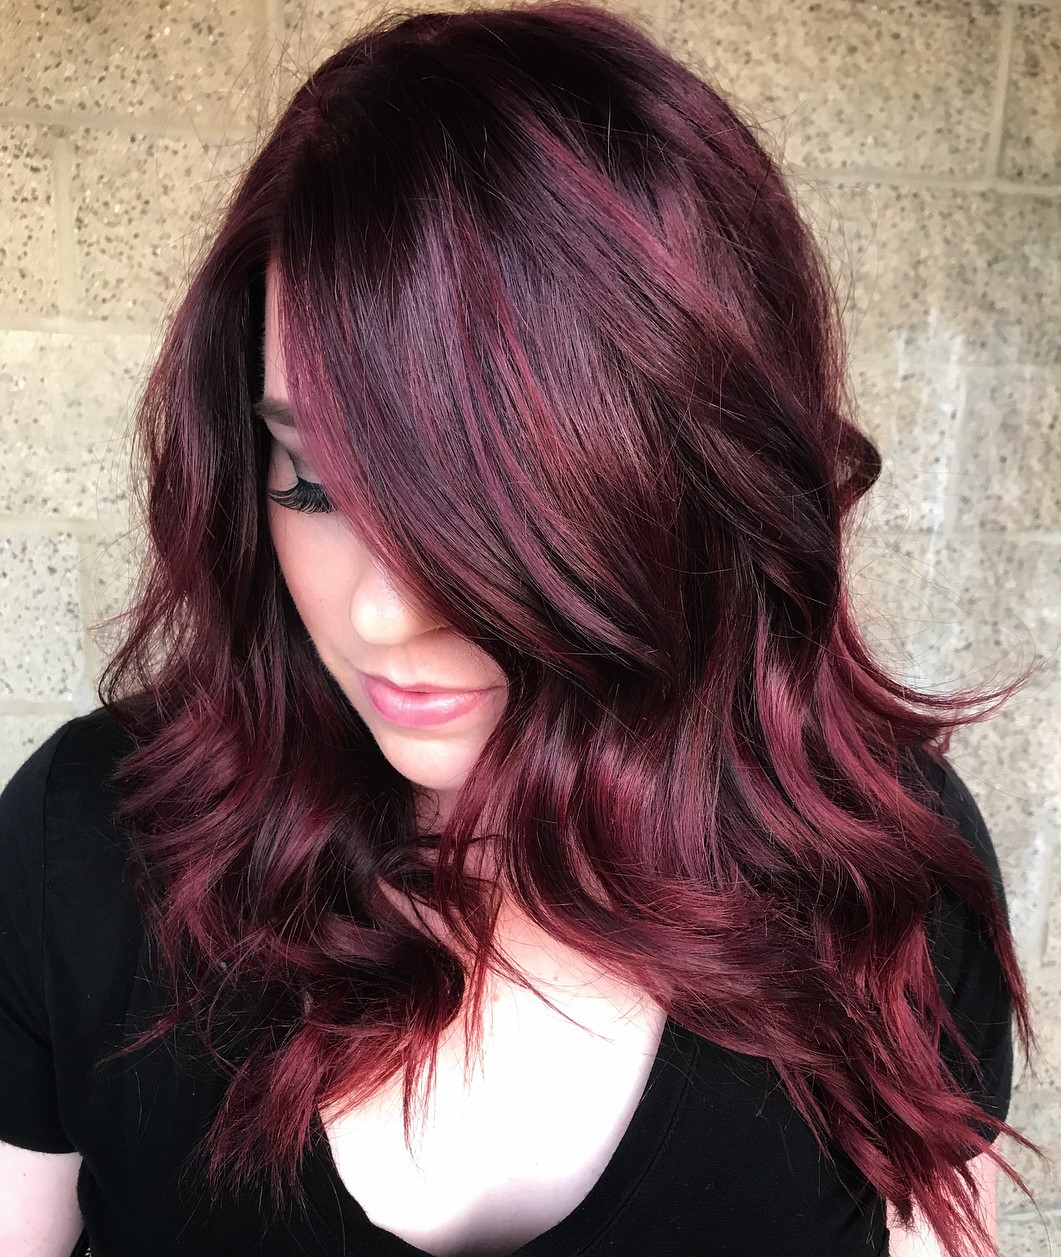 Glam Dark Hair with Burgundy Highlights